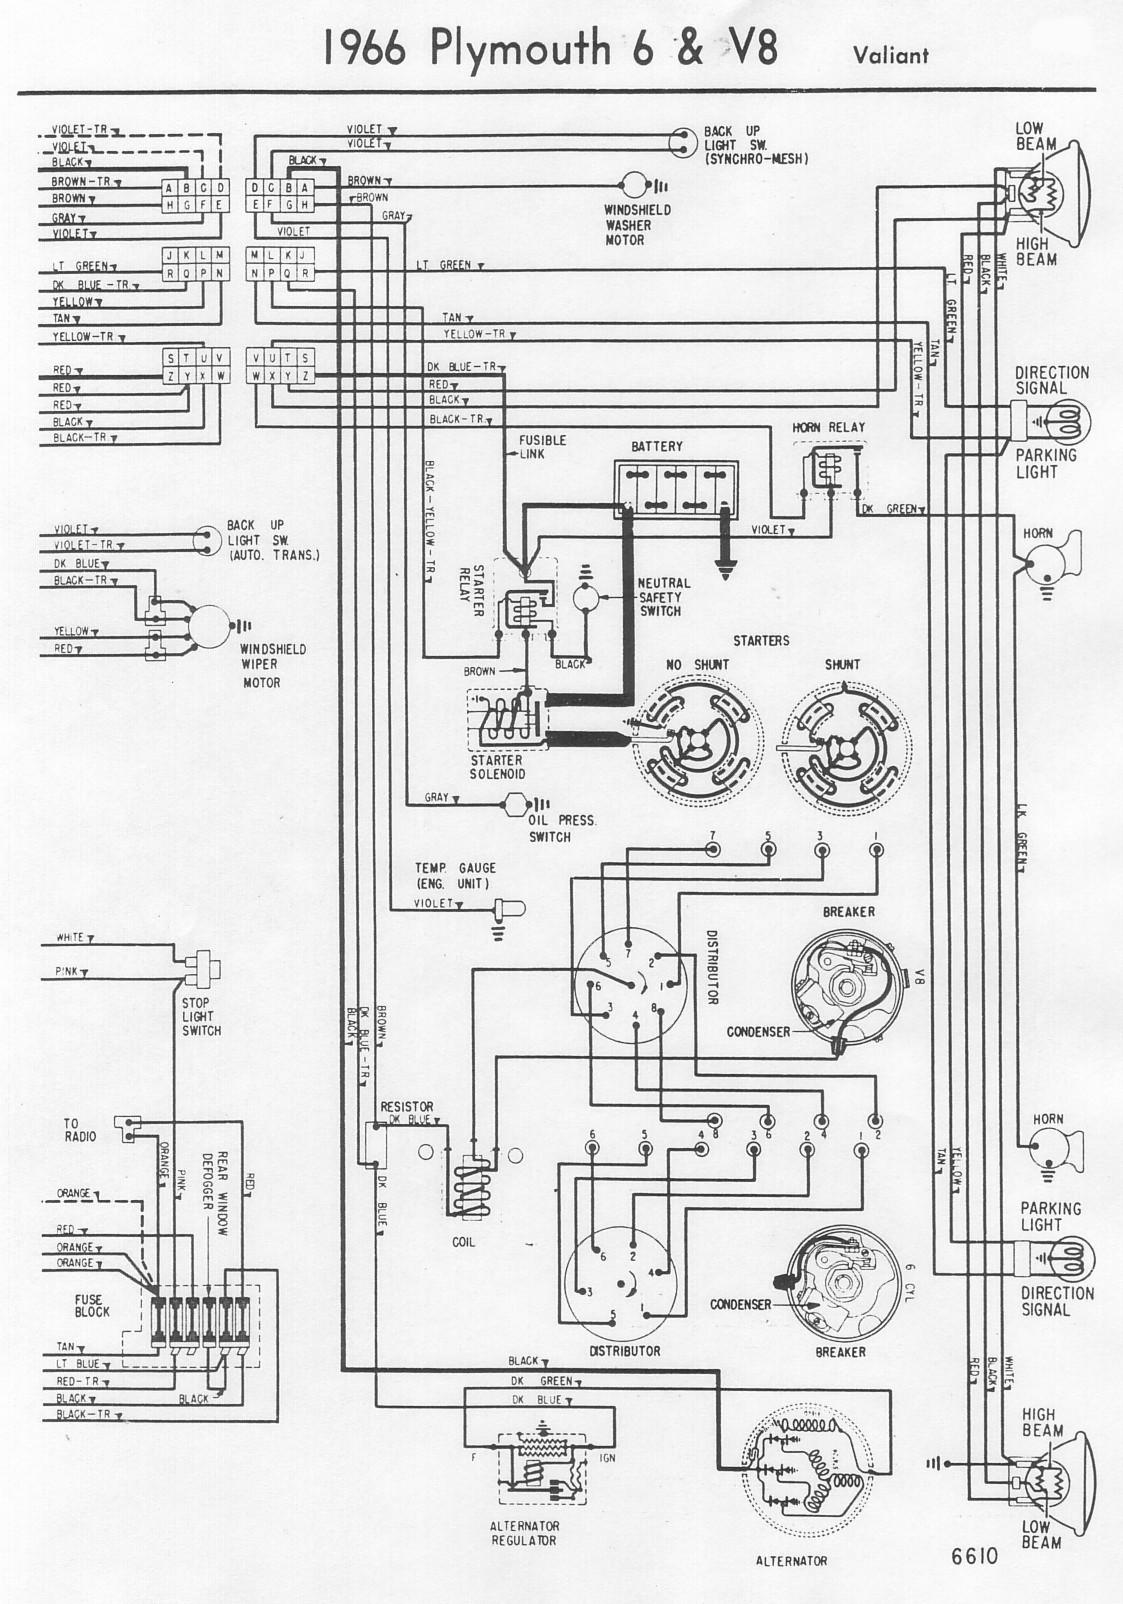 1966 Impala Alternator Wiring Diagram Electrical Diagrams 07 1964 Trusted 2007